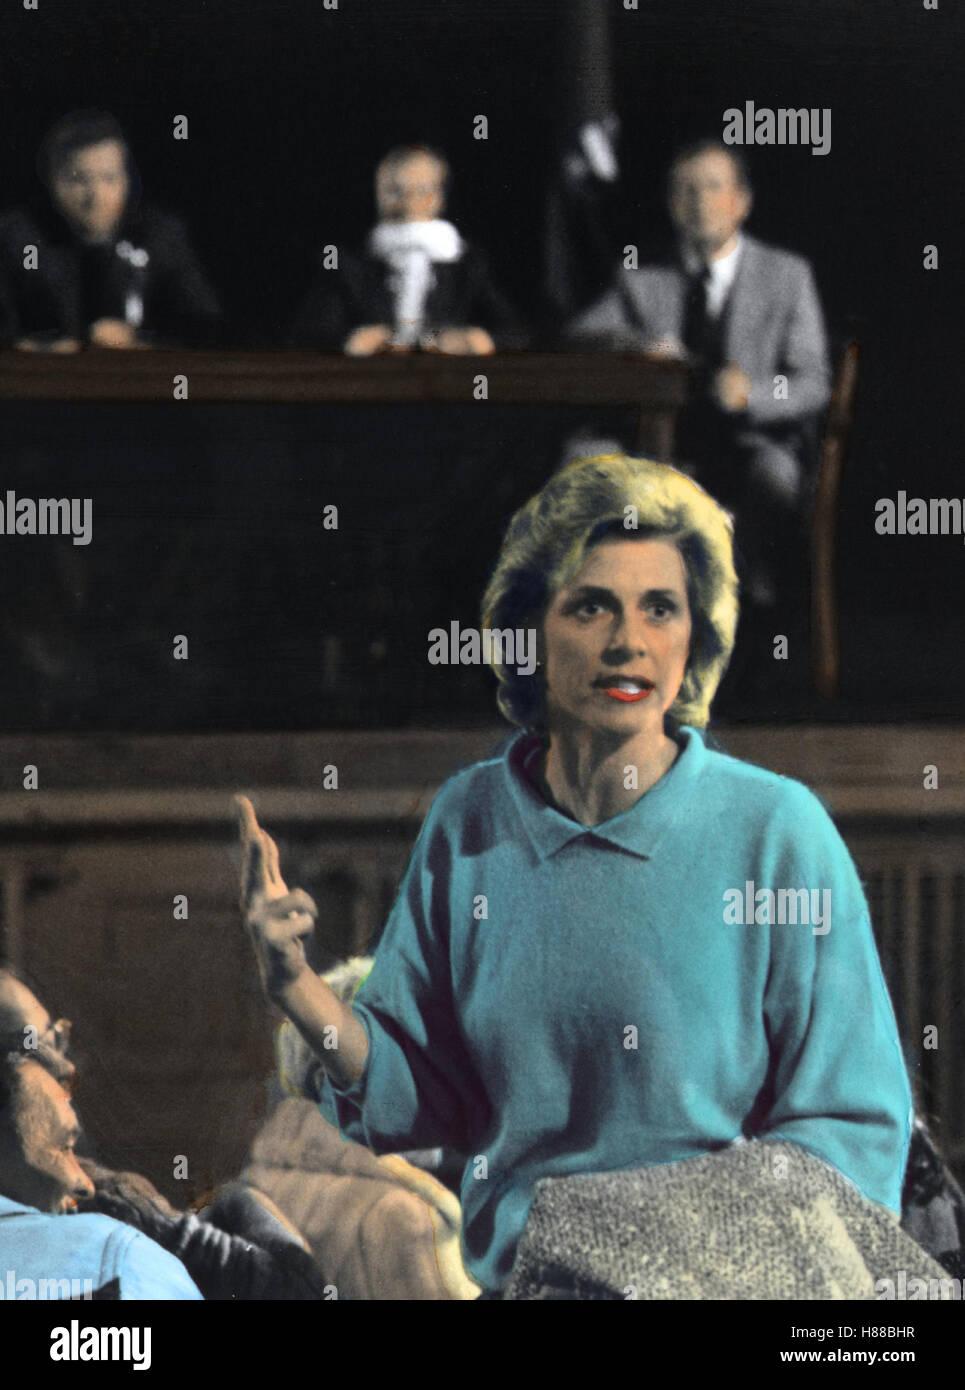 Ming-Na Wen,Wilma Pelly Sex archive Solenn Heussaff (b. 1985),Julianne Buescher